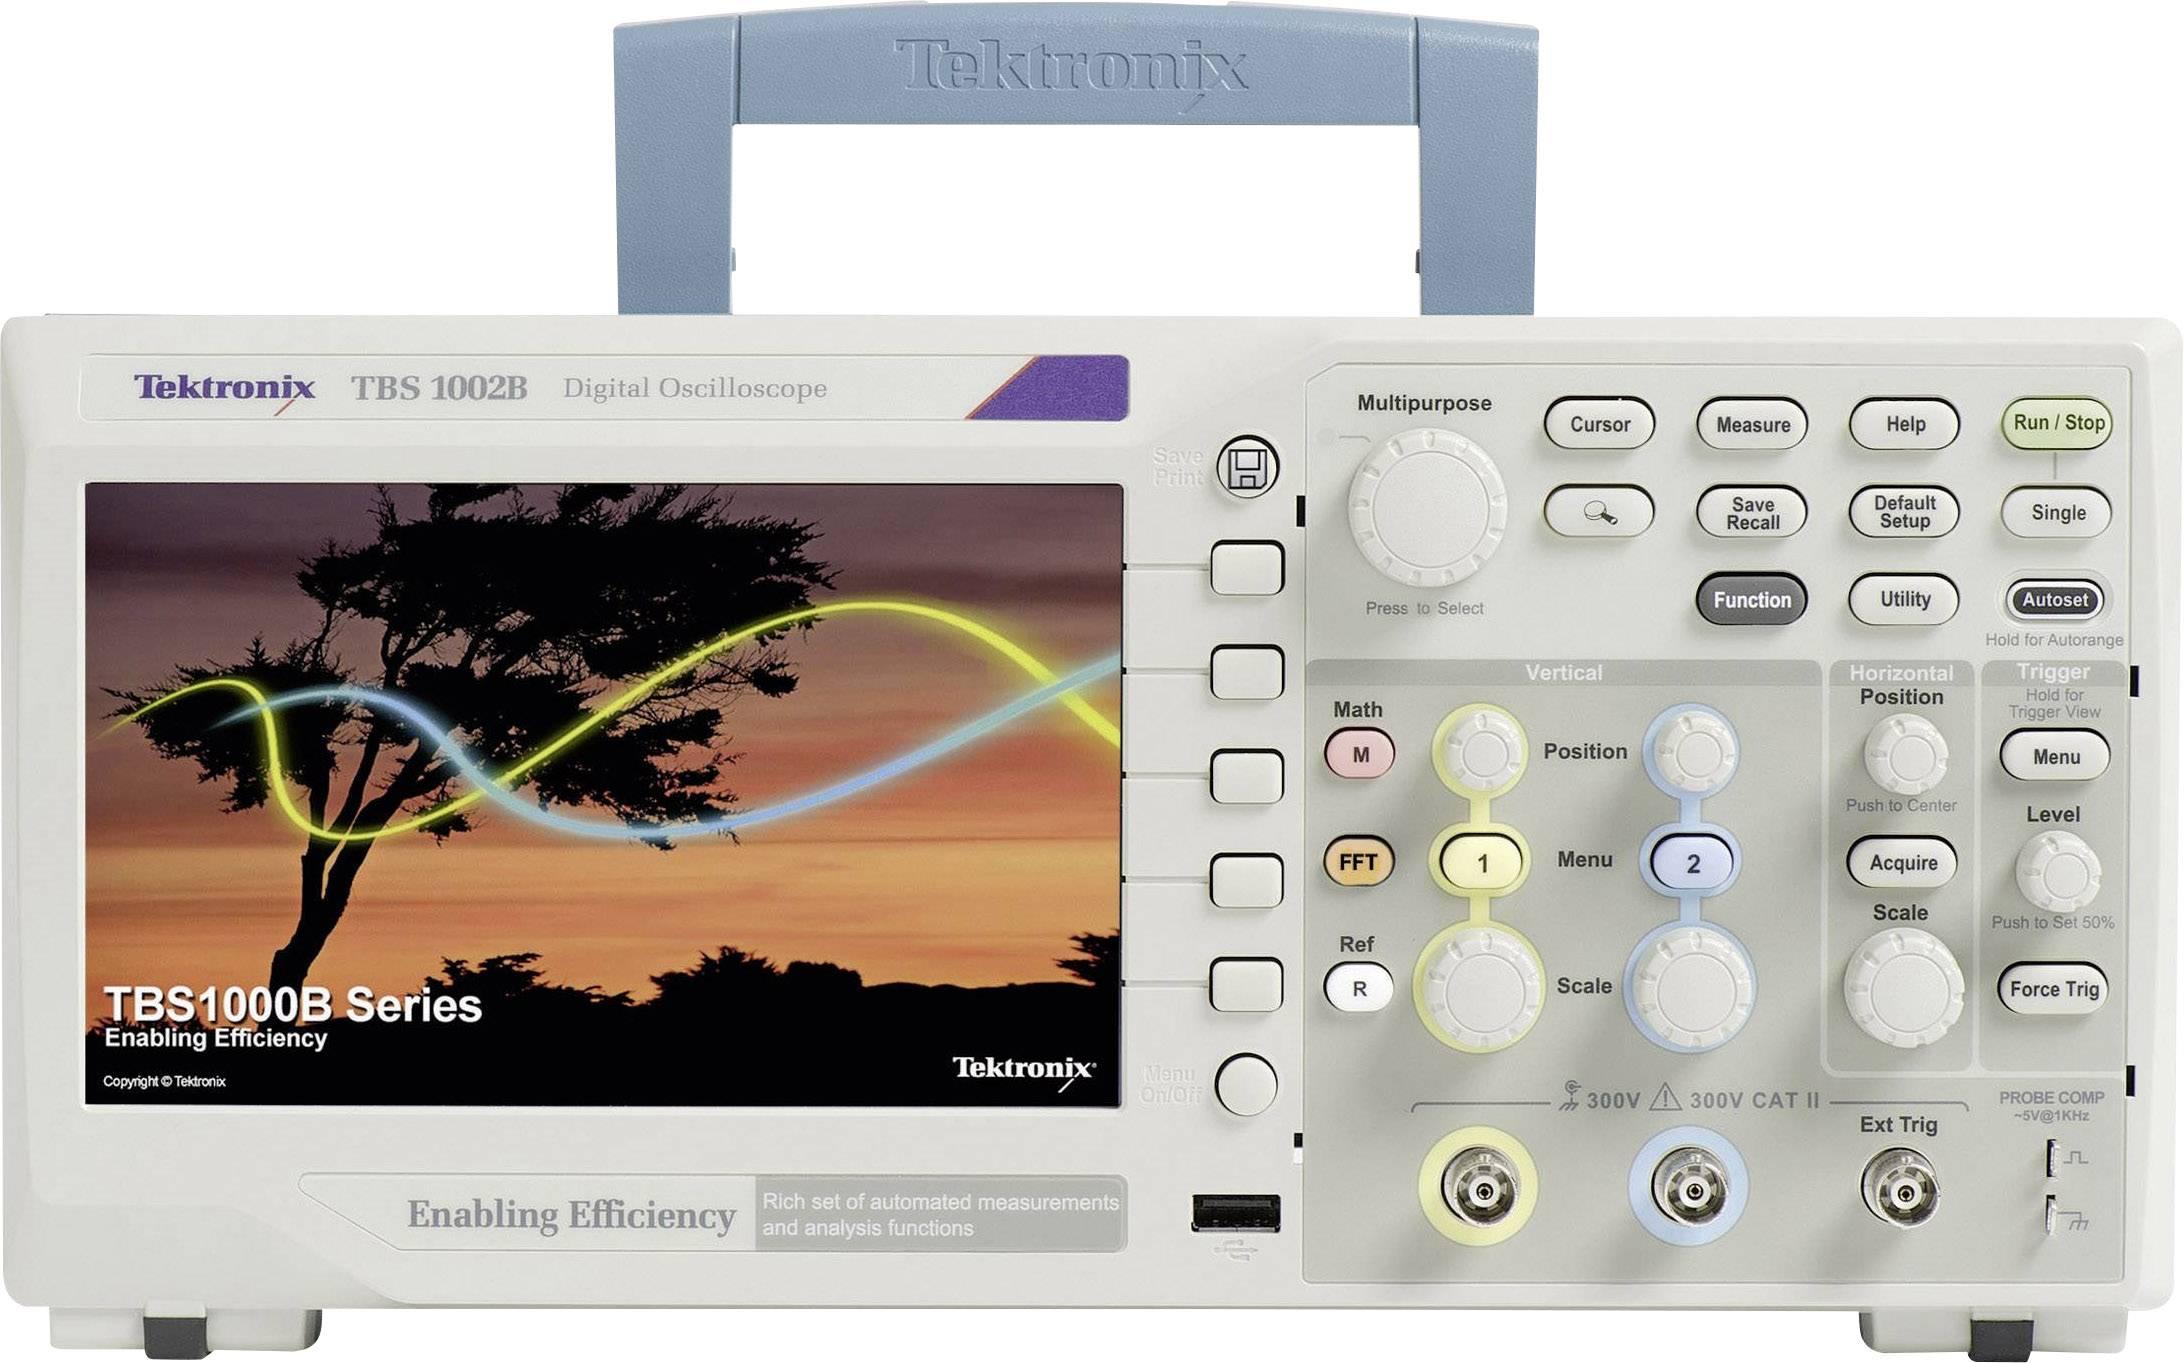 Digitálny osciloskop Tektronix TBS1102B, 100 MHz, 2-kanálový, kalibrácia podľa ISO